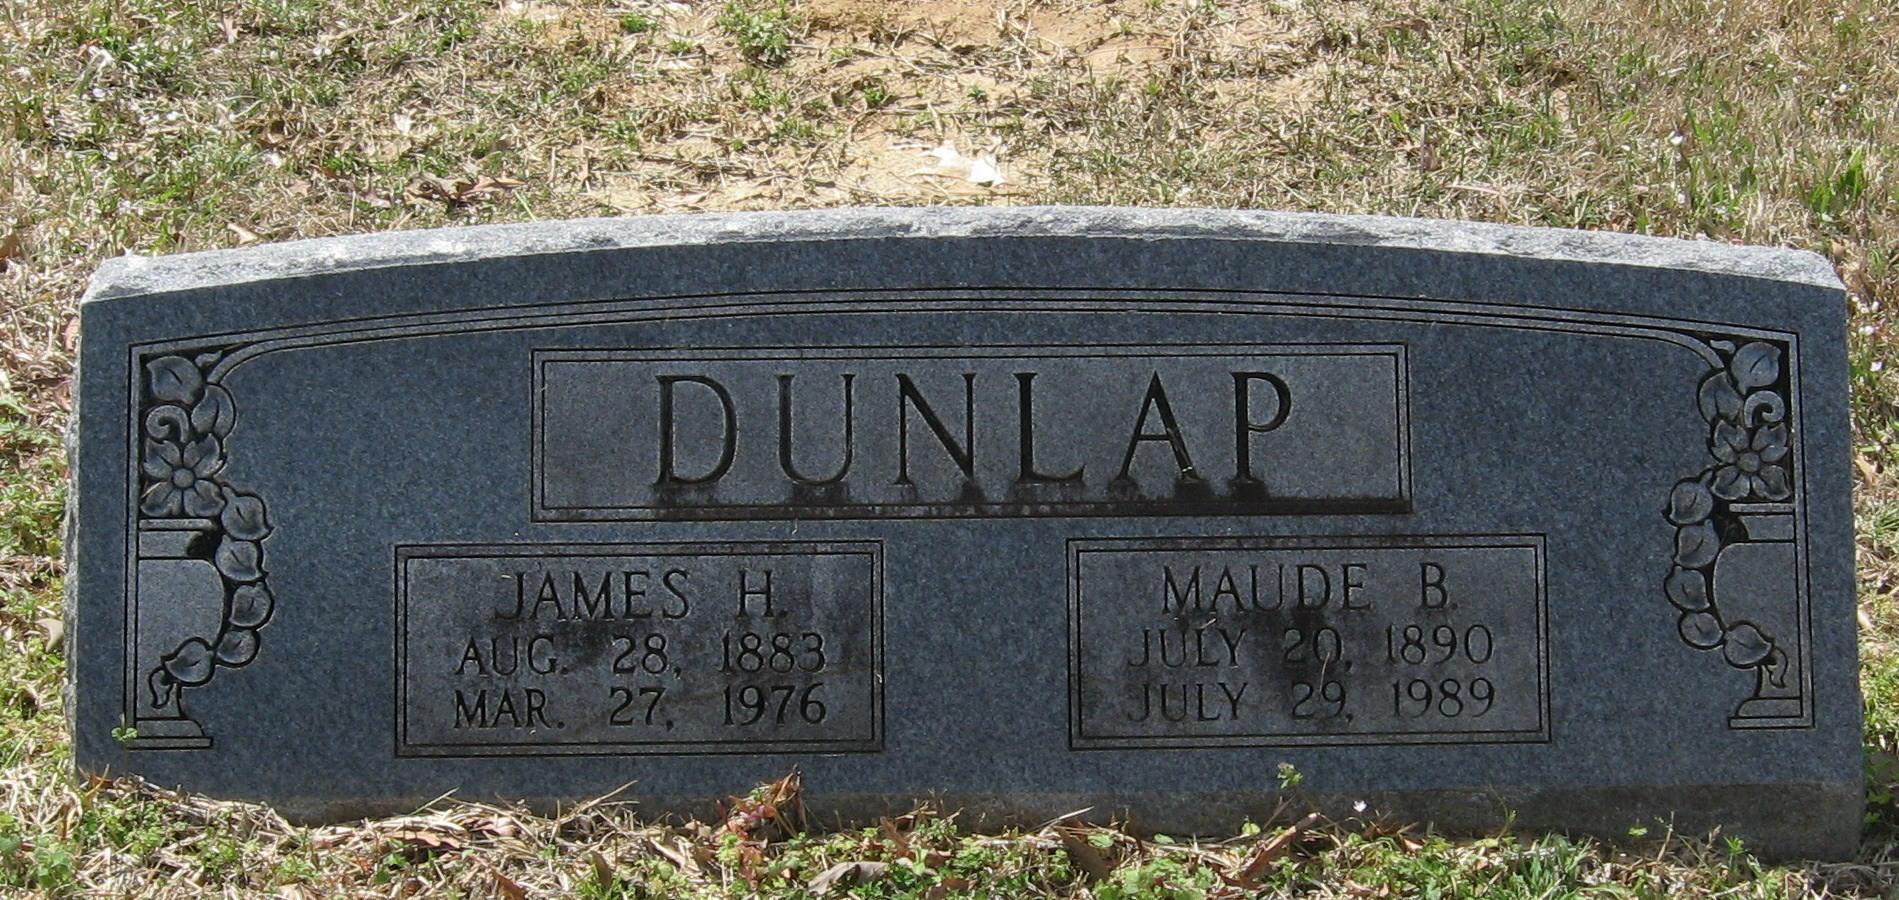 James Harvey Dunlap